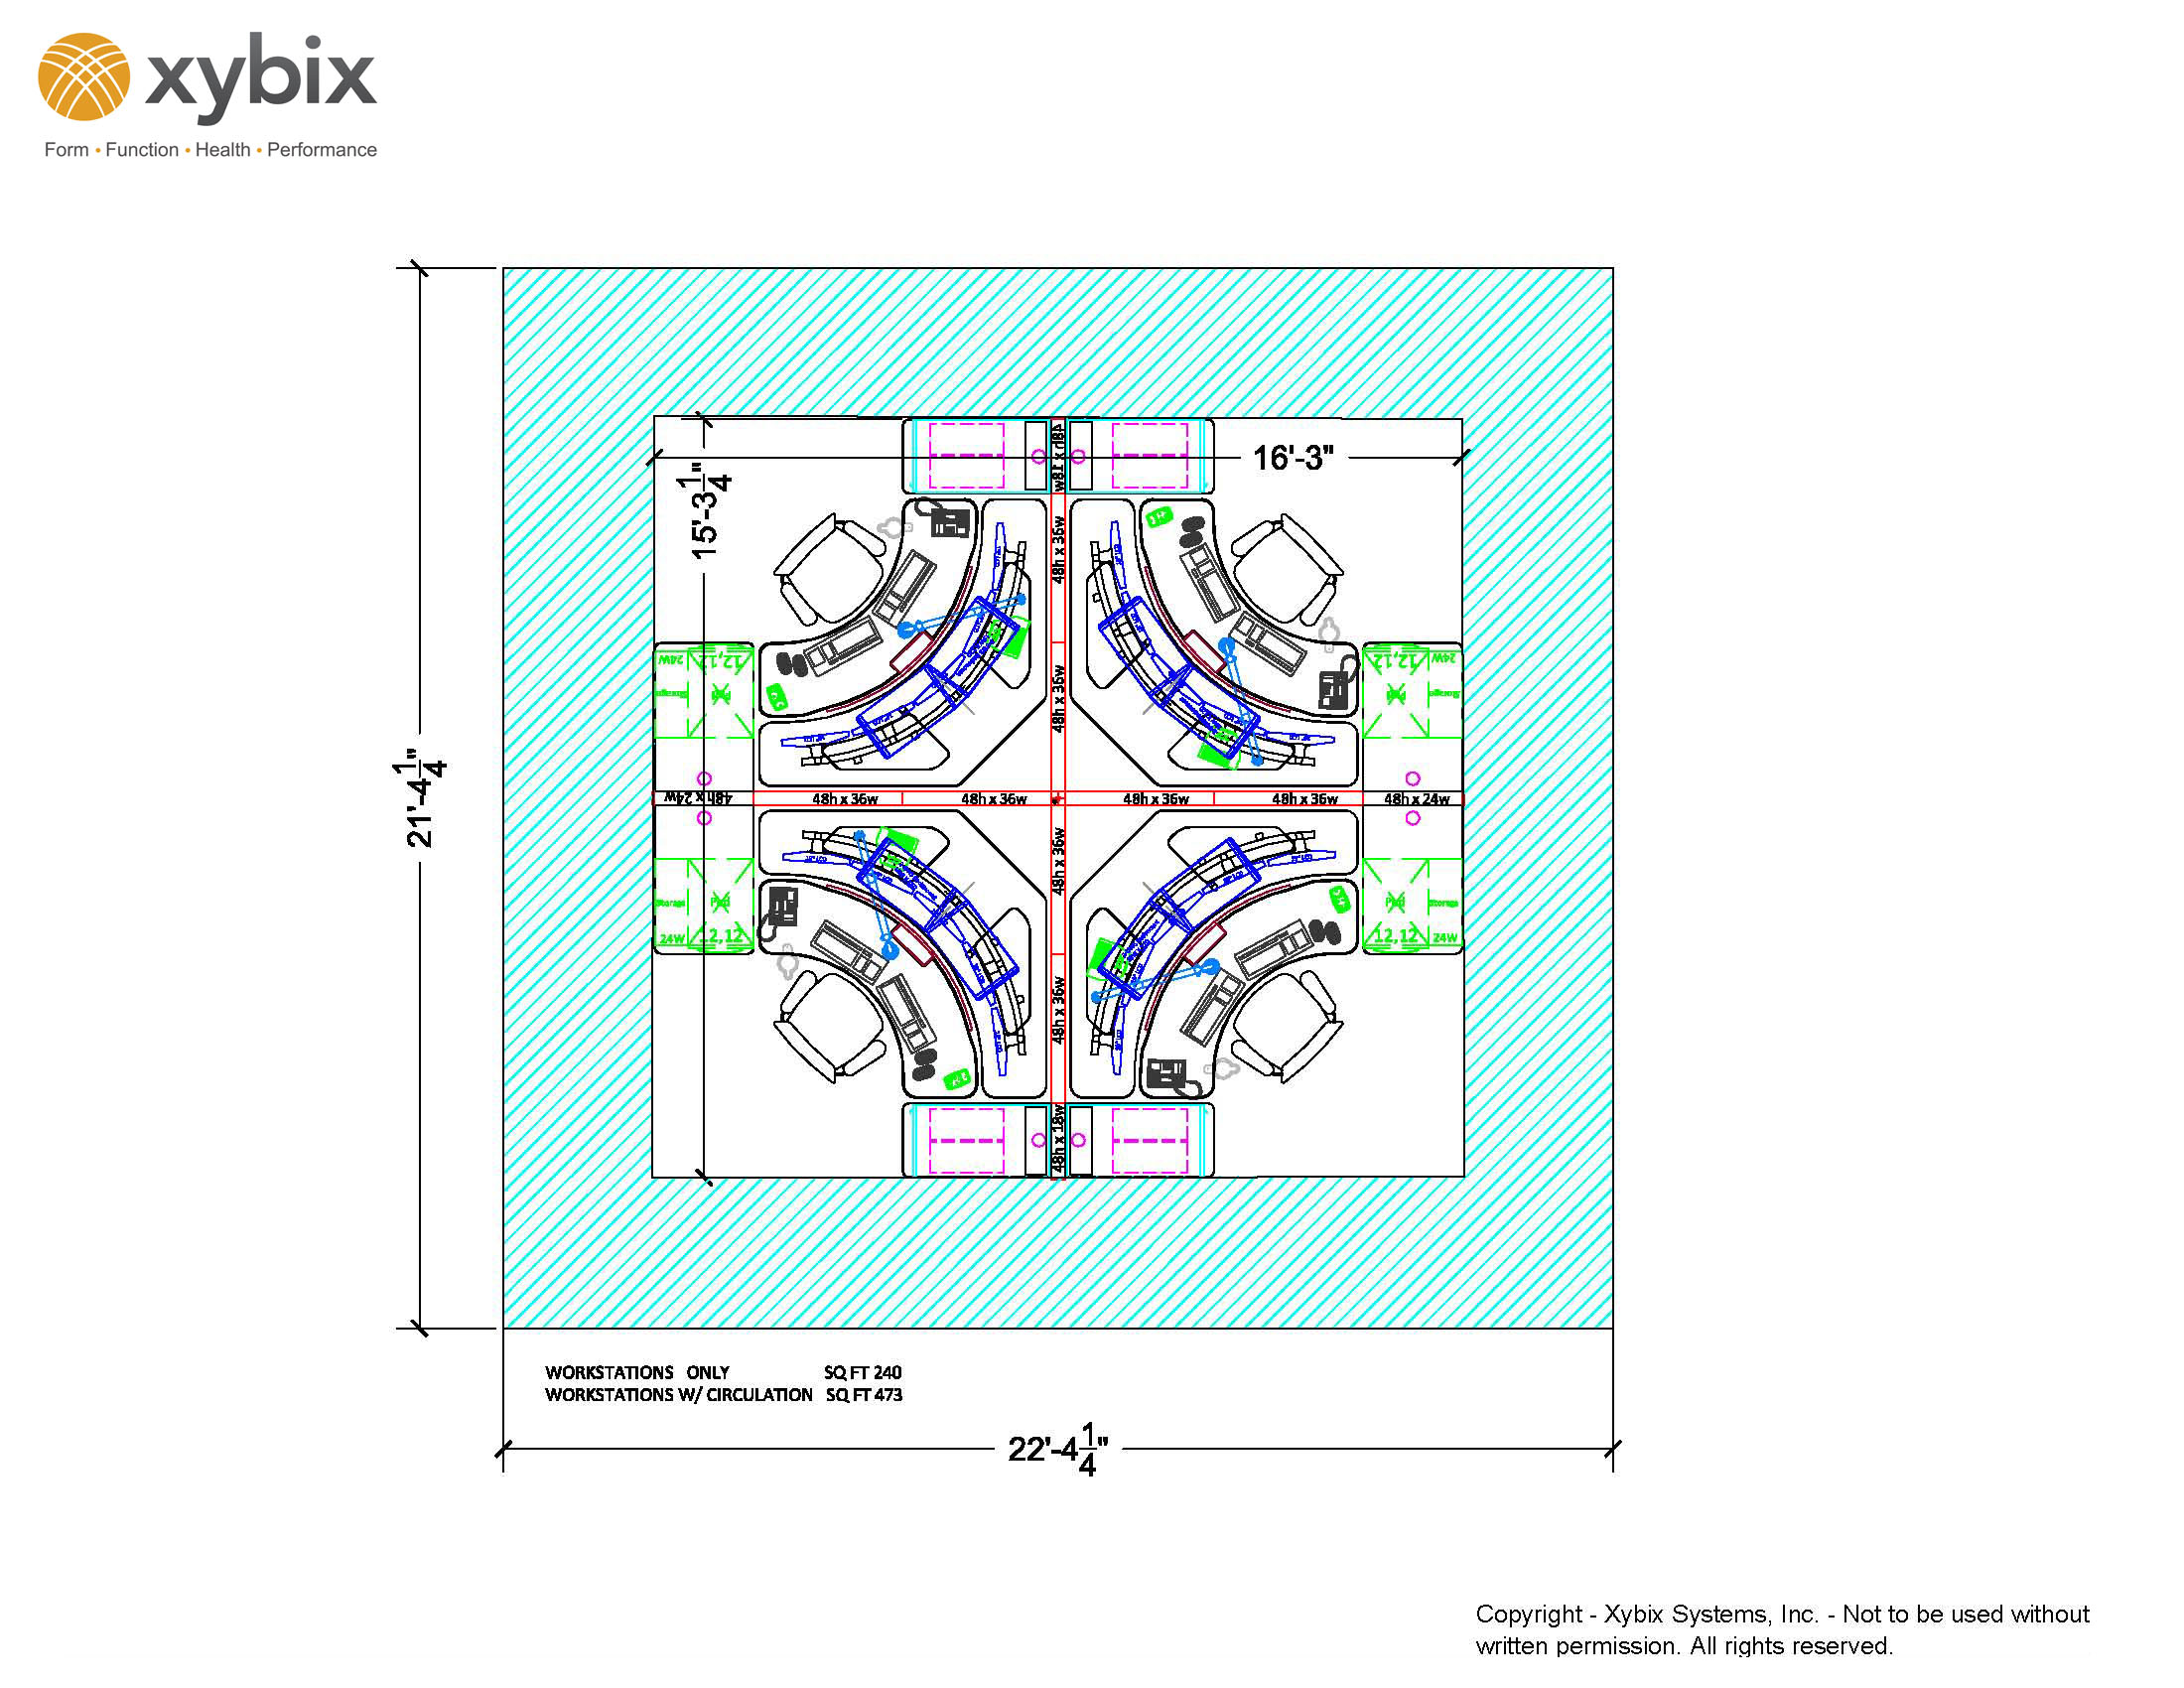 Xybix Typical Ex3